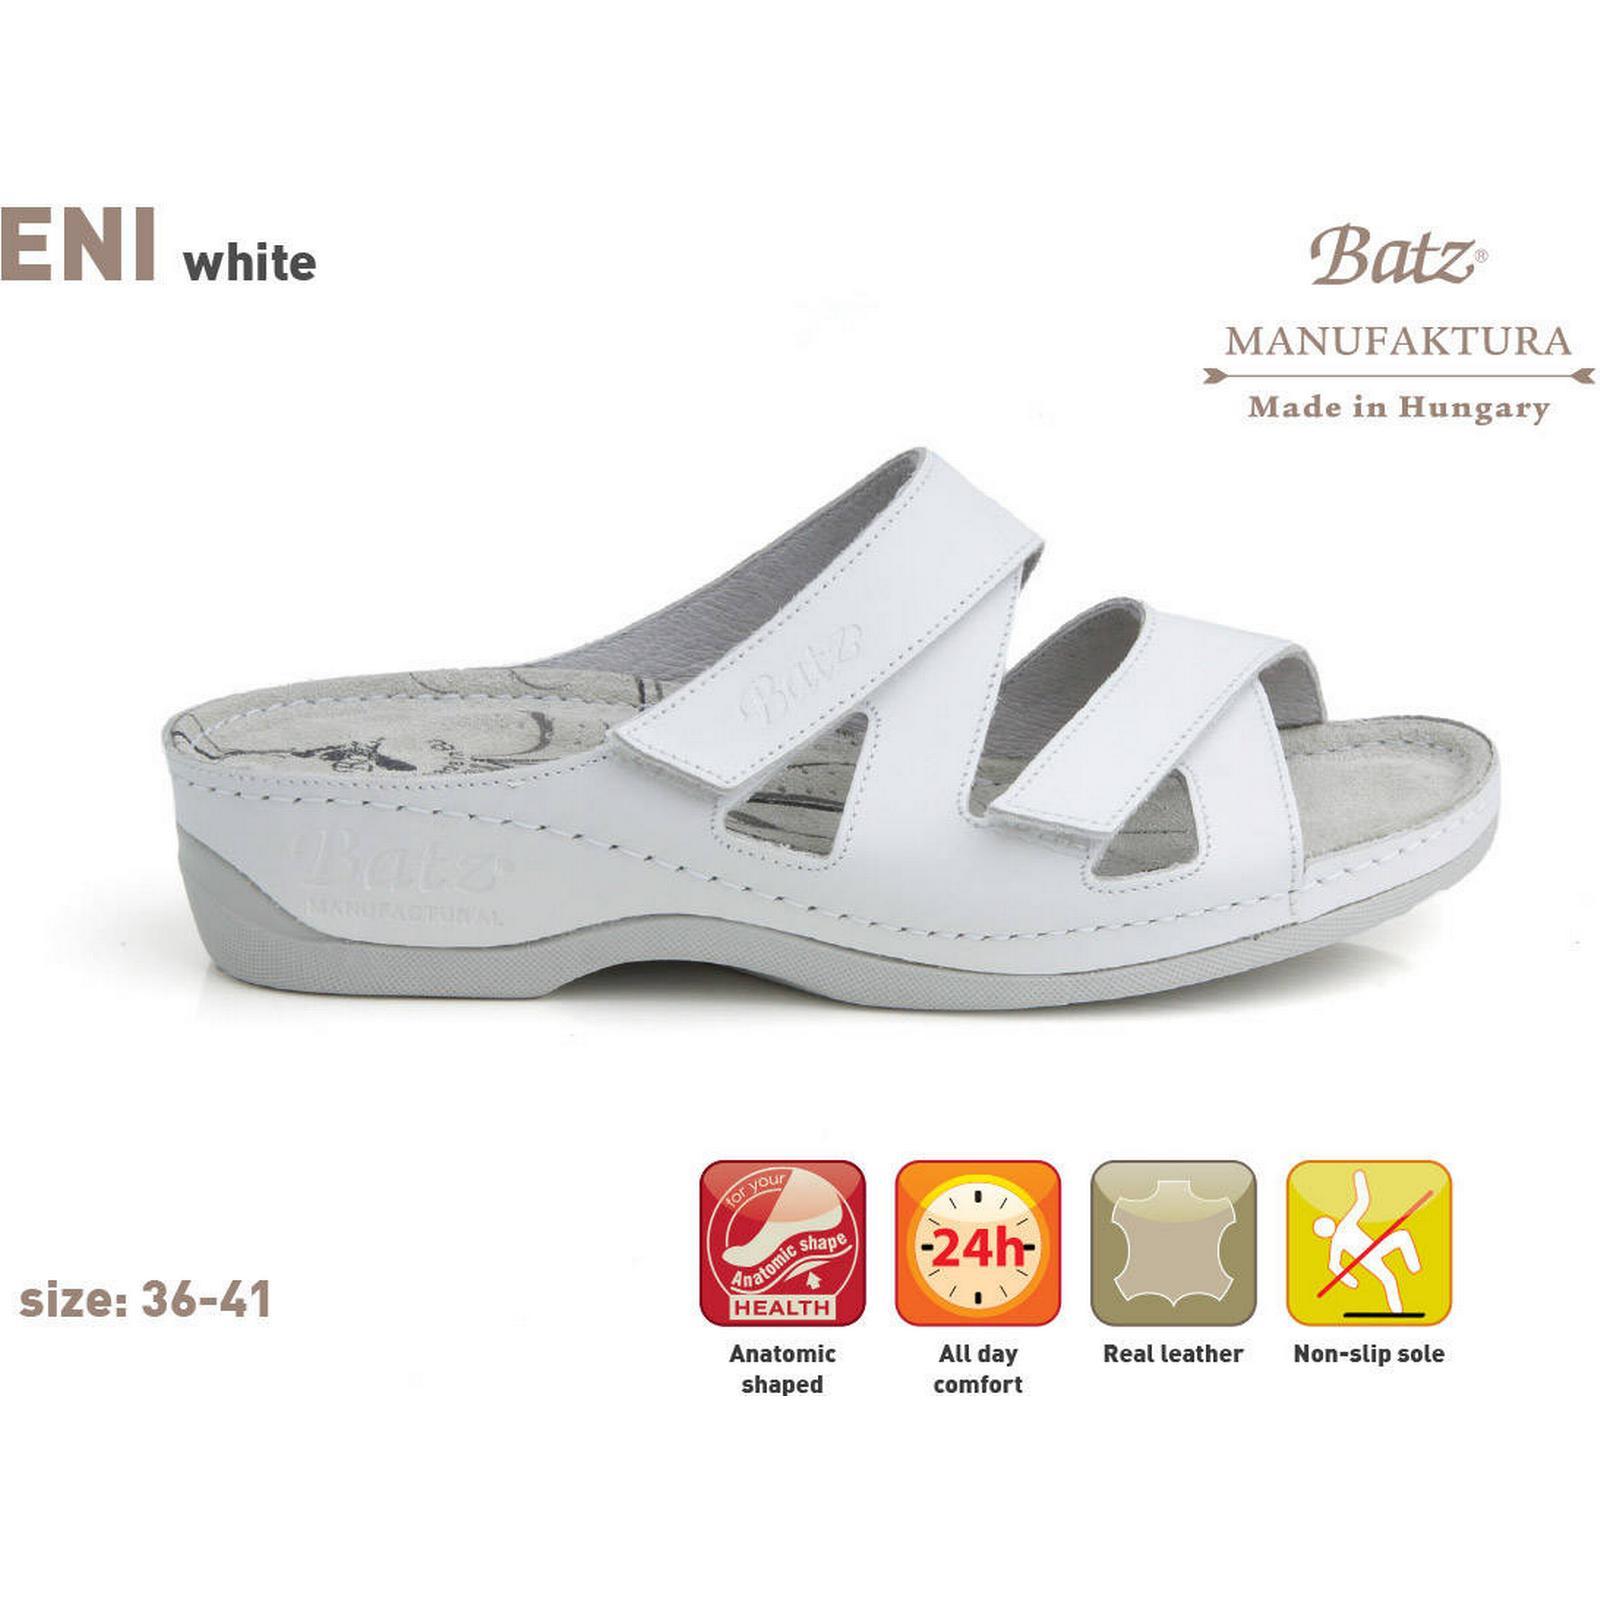 BatzShop Batz ENI - white 5) - EU 38 (UK 5) white dbe733